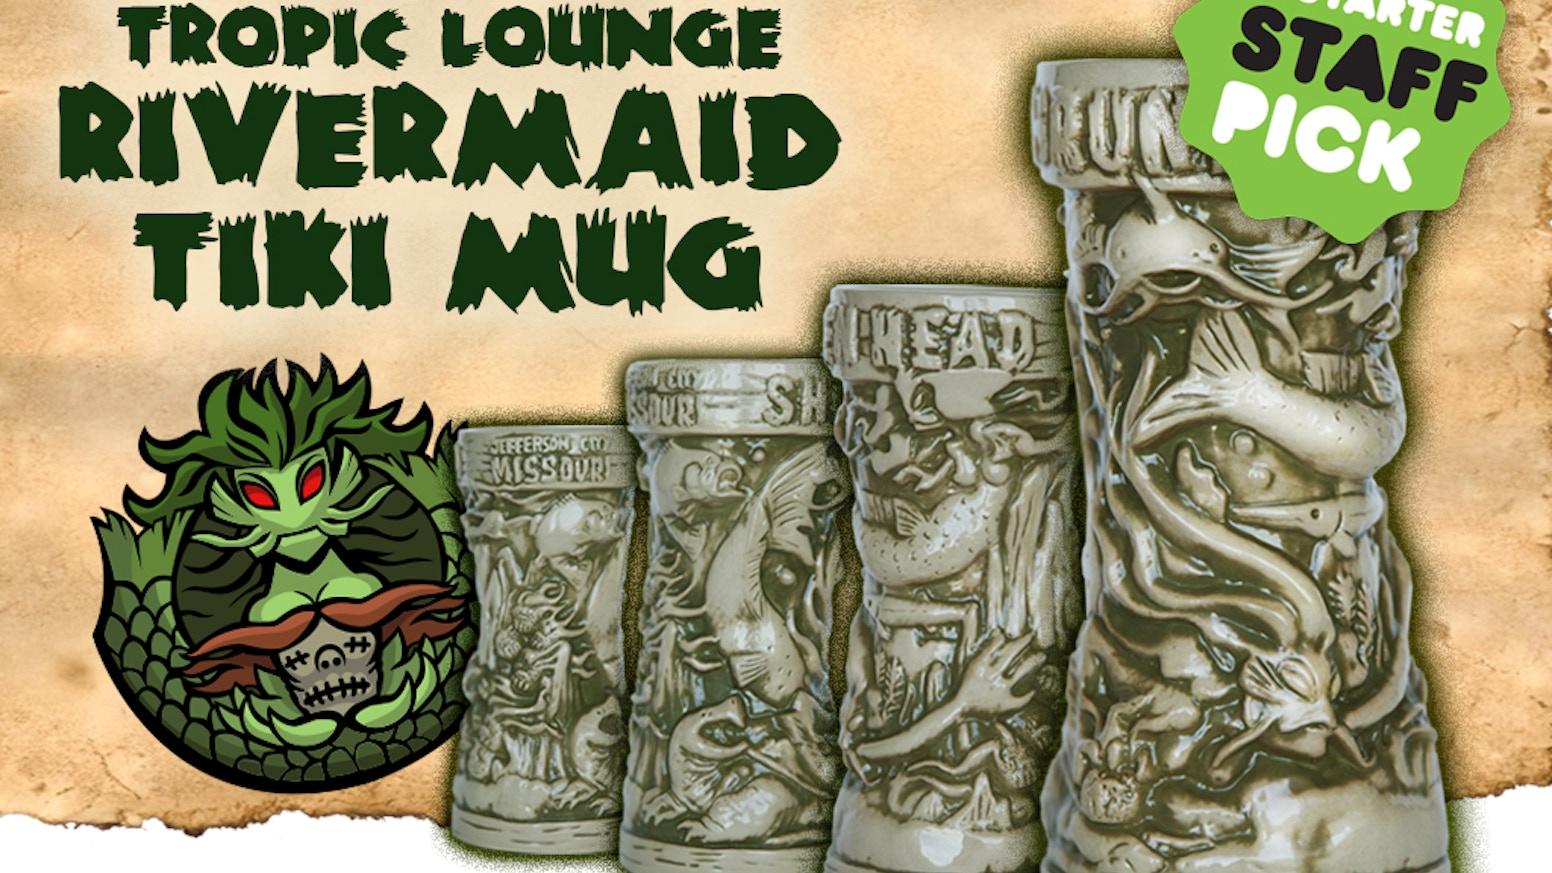 Help small tiki bars create custom mugs starting with the 'Shrunken Head Rivermaid Tiki Mug'. Exclusive swag-art and fez available!